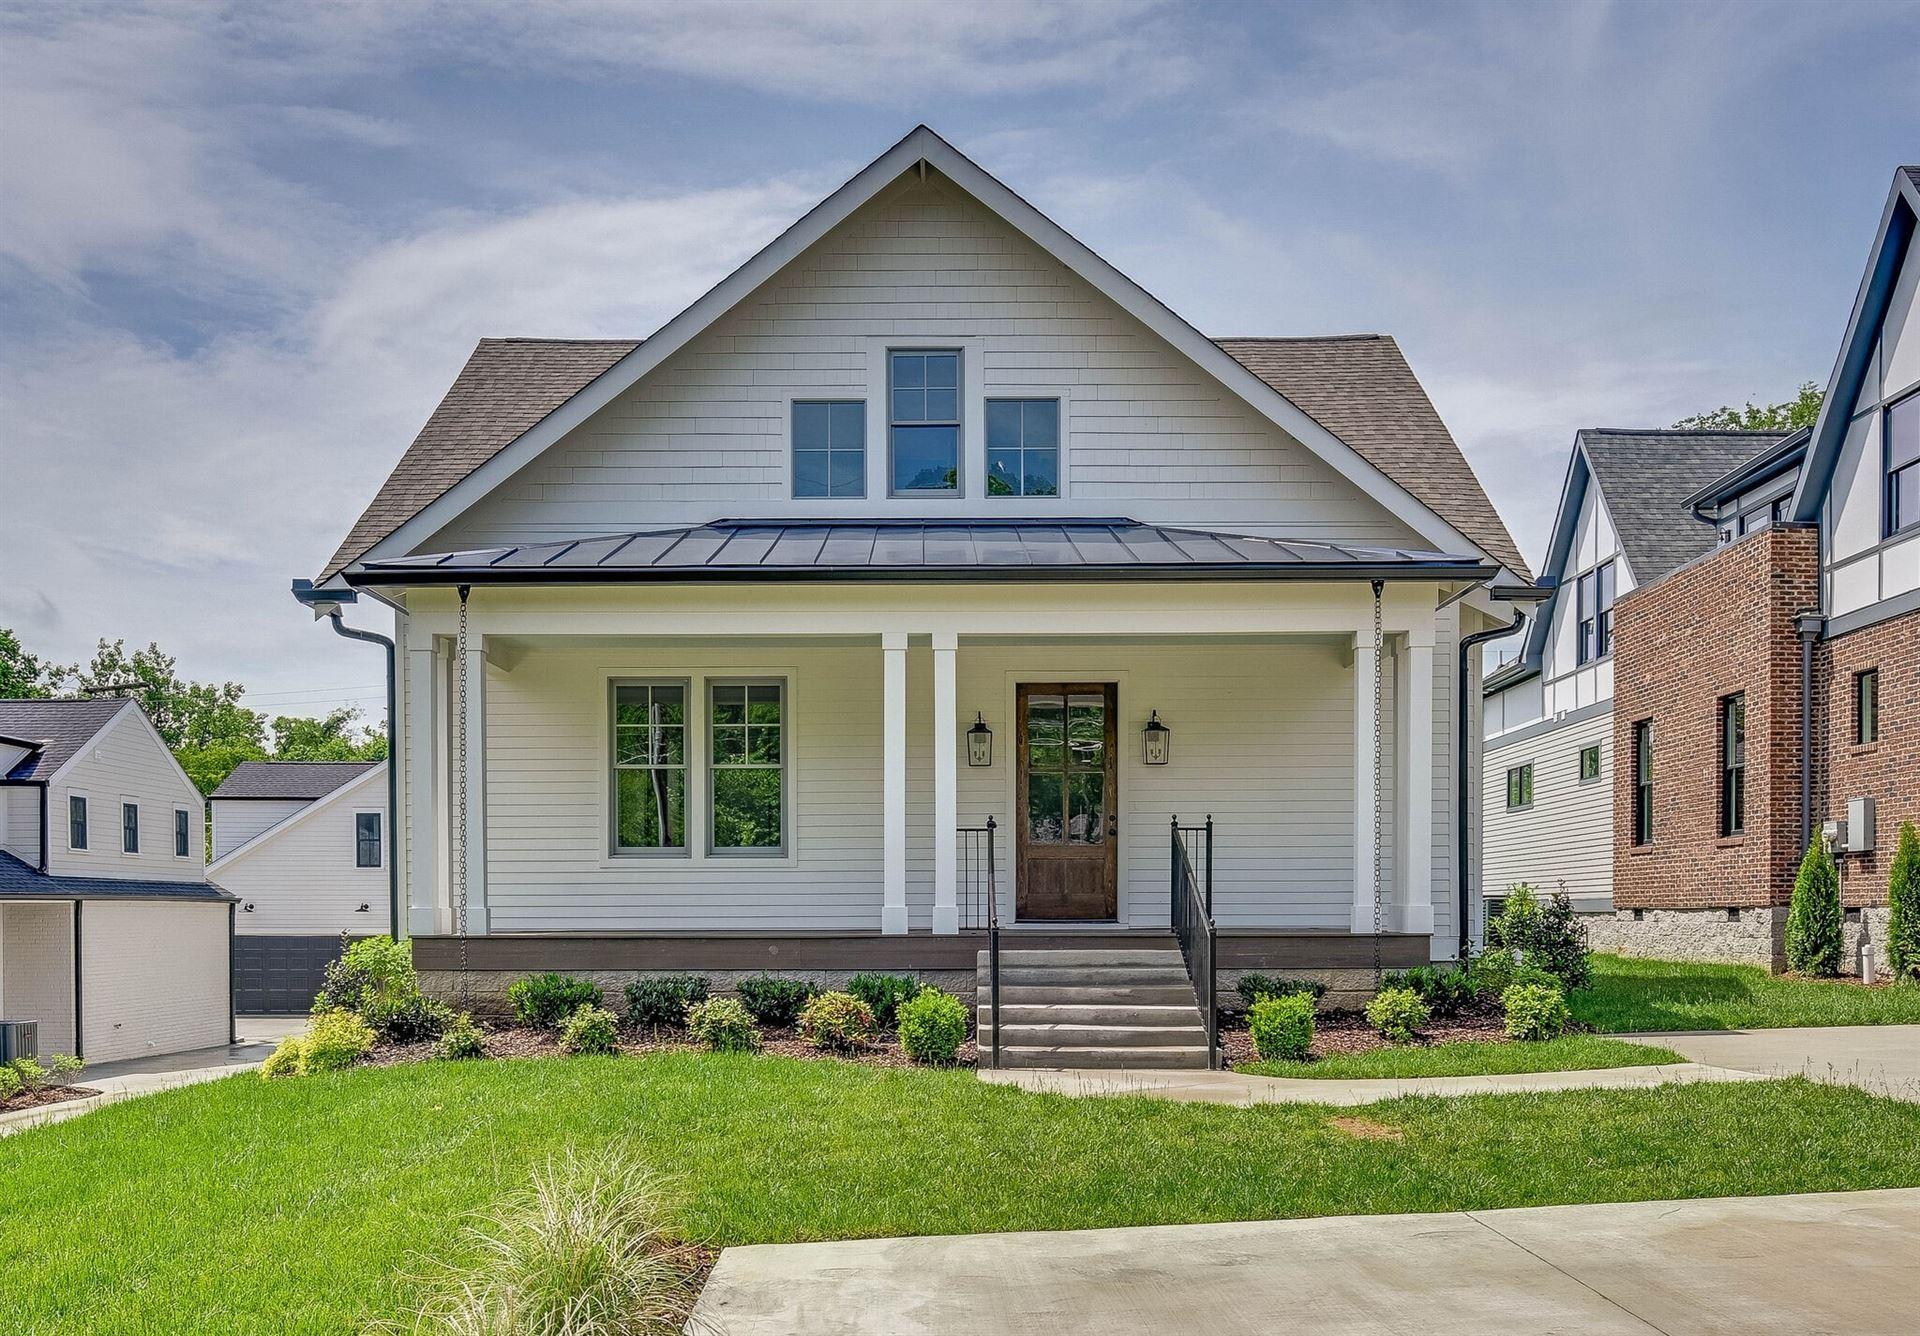 1817 Sweetbriar Ave, Nashville, TN 37212 - MLS#: 2183807